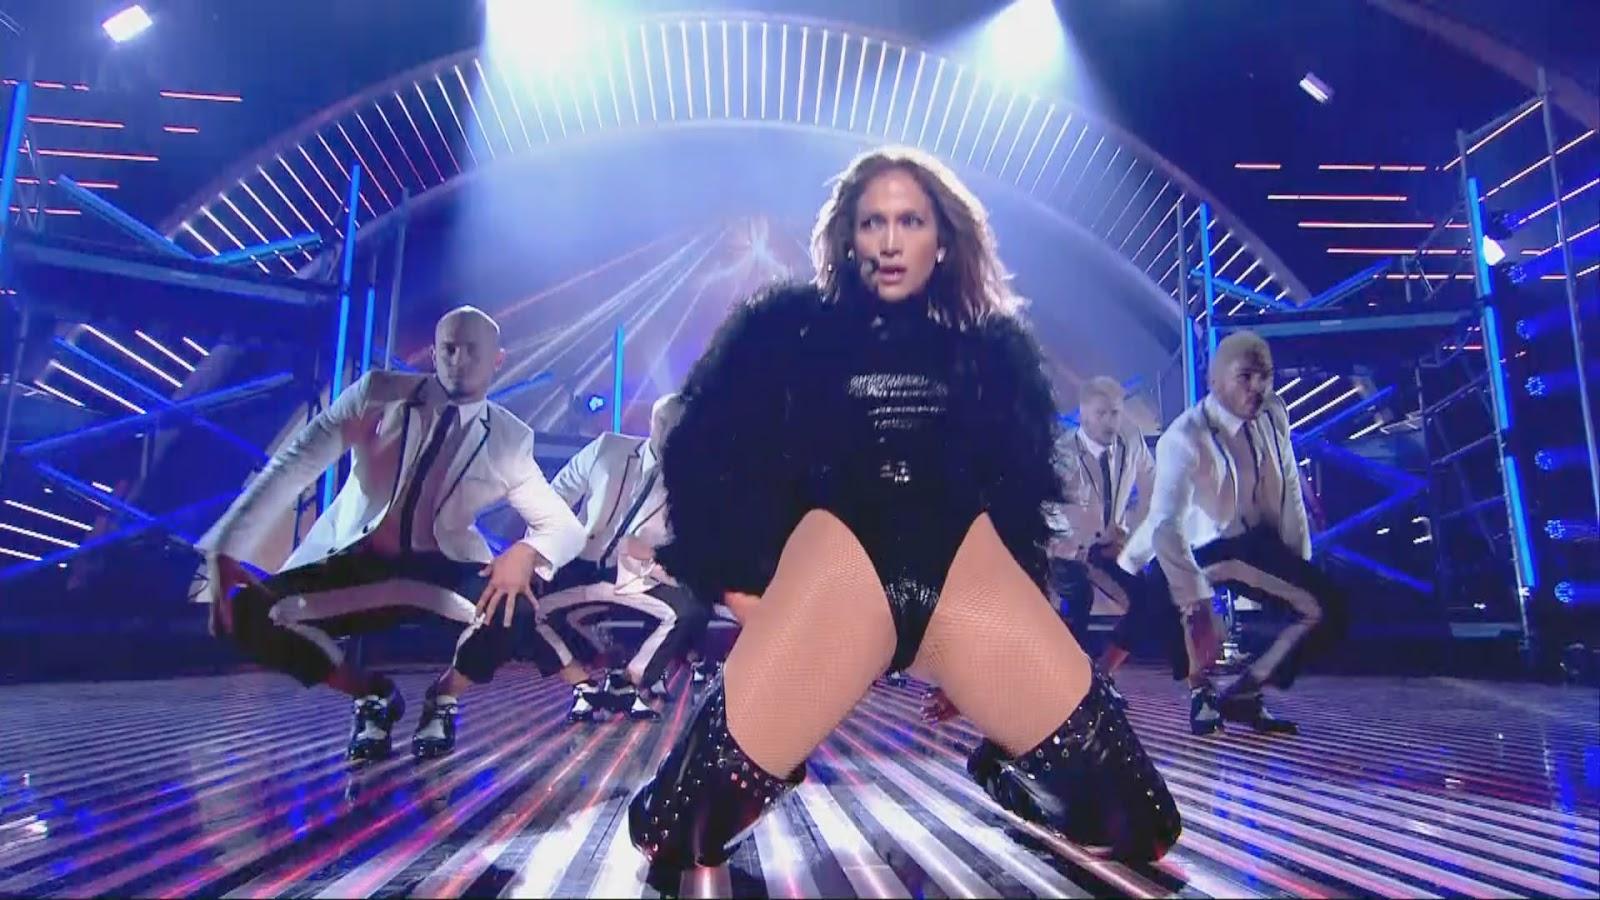 Live Performance Music Videos Jennifer Lopez Live It Up: where does jennifer lopez live